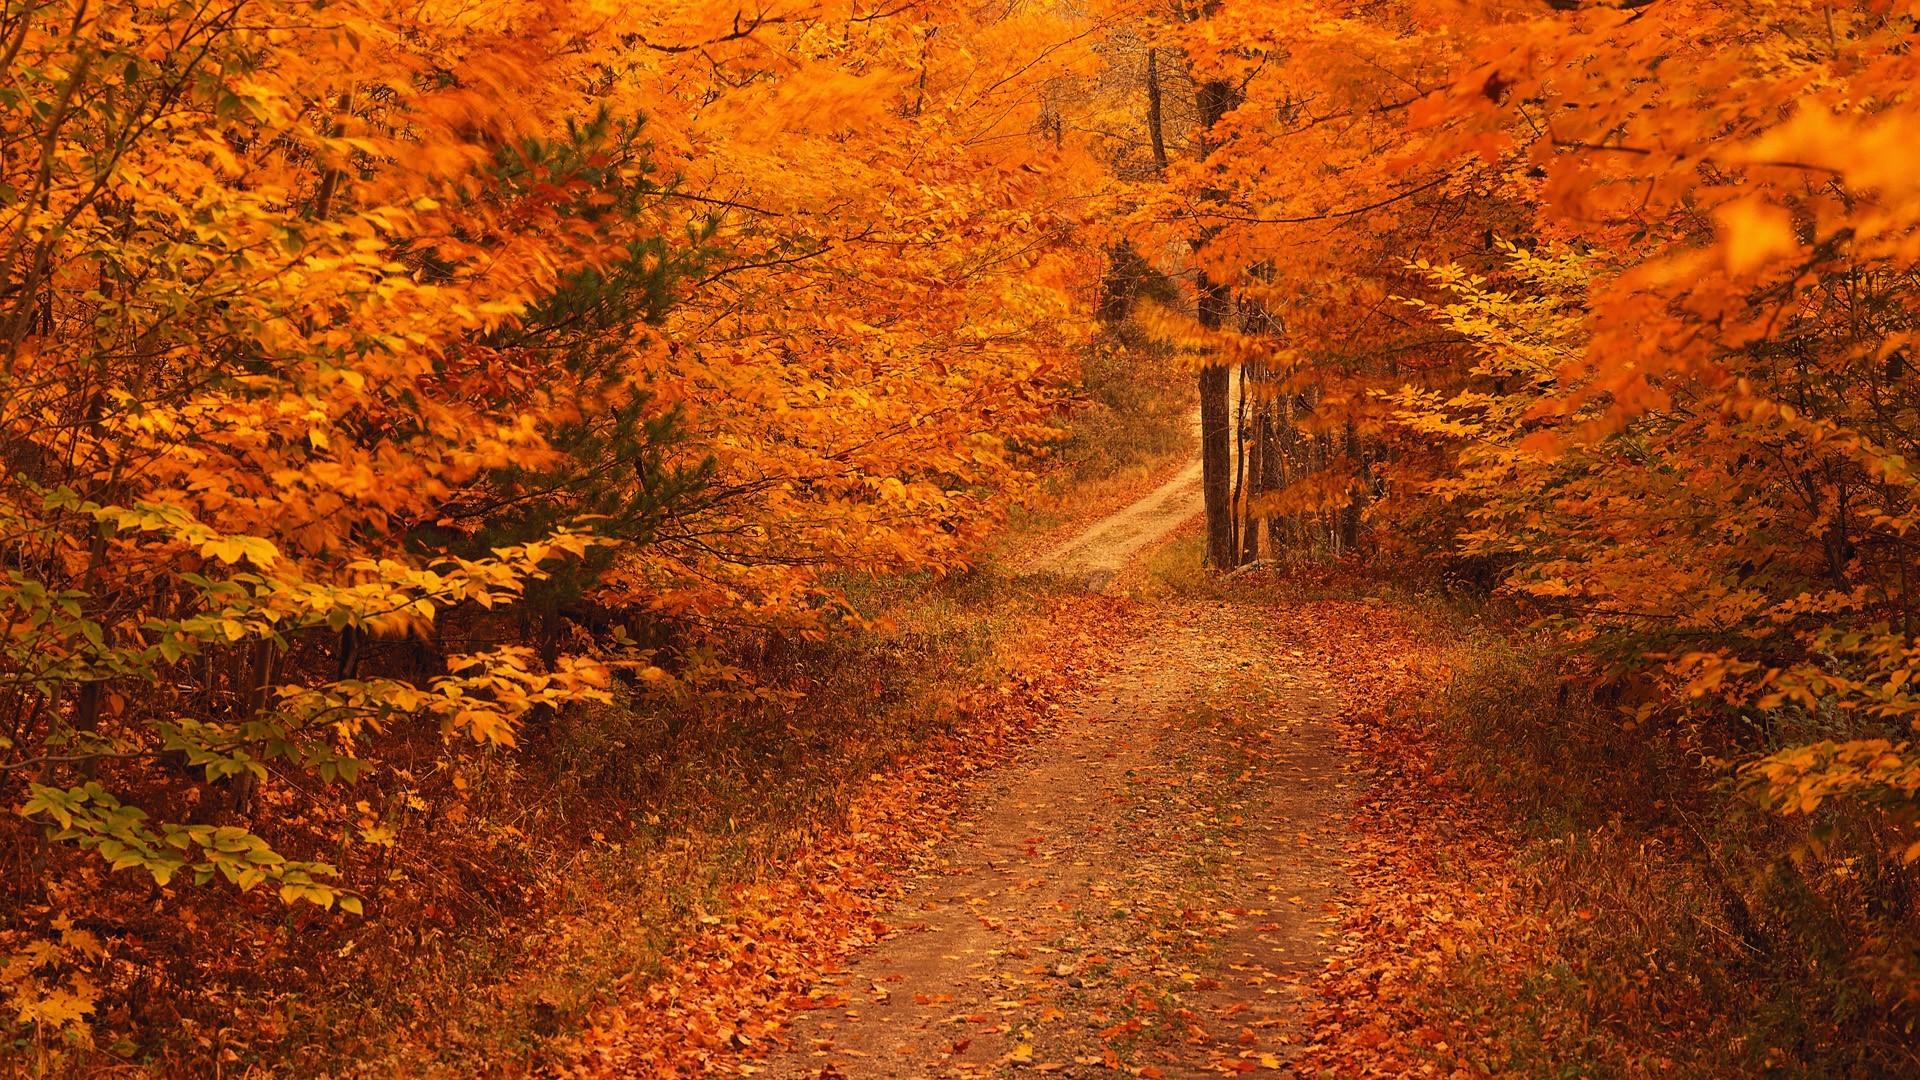 Fall Season Desktop Backgrounds   Desktop Image